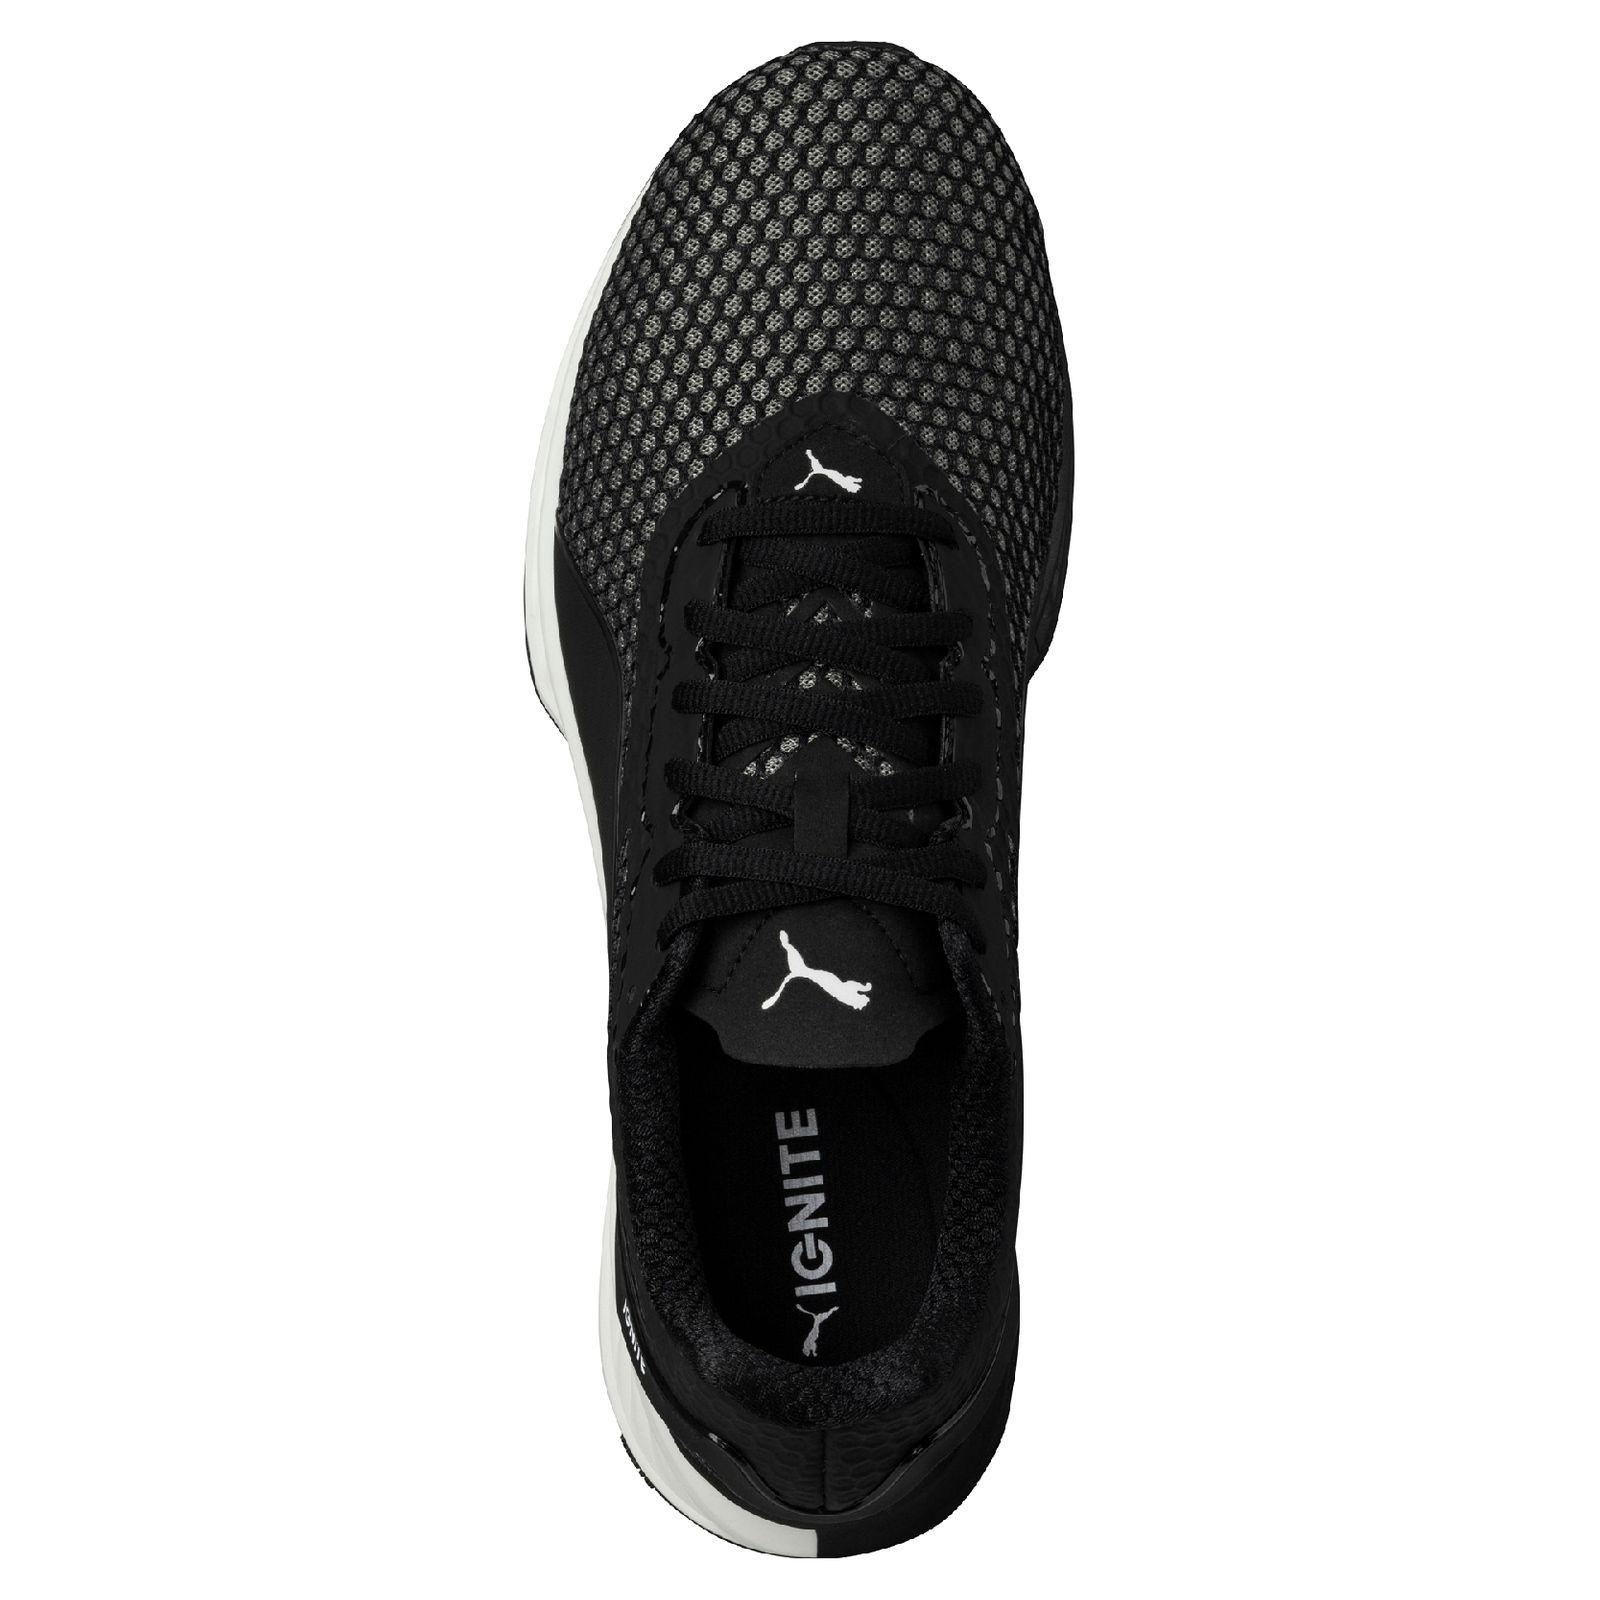 da9b270244b Puma Herren Running-Schuh IGNITE 3 189449-05 Puma Black-White – Bild